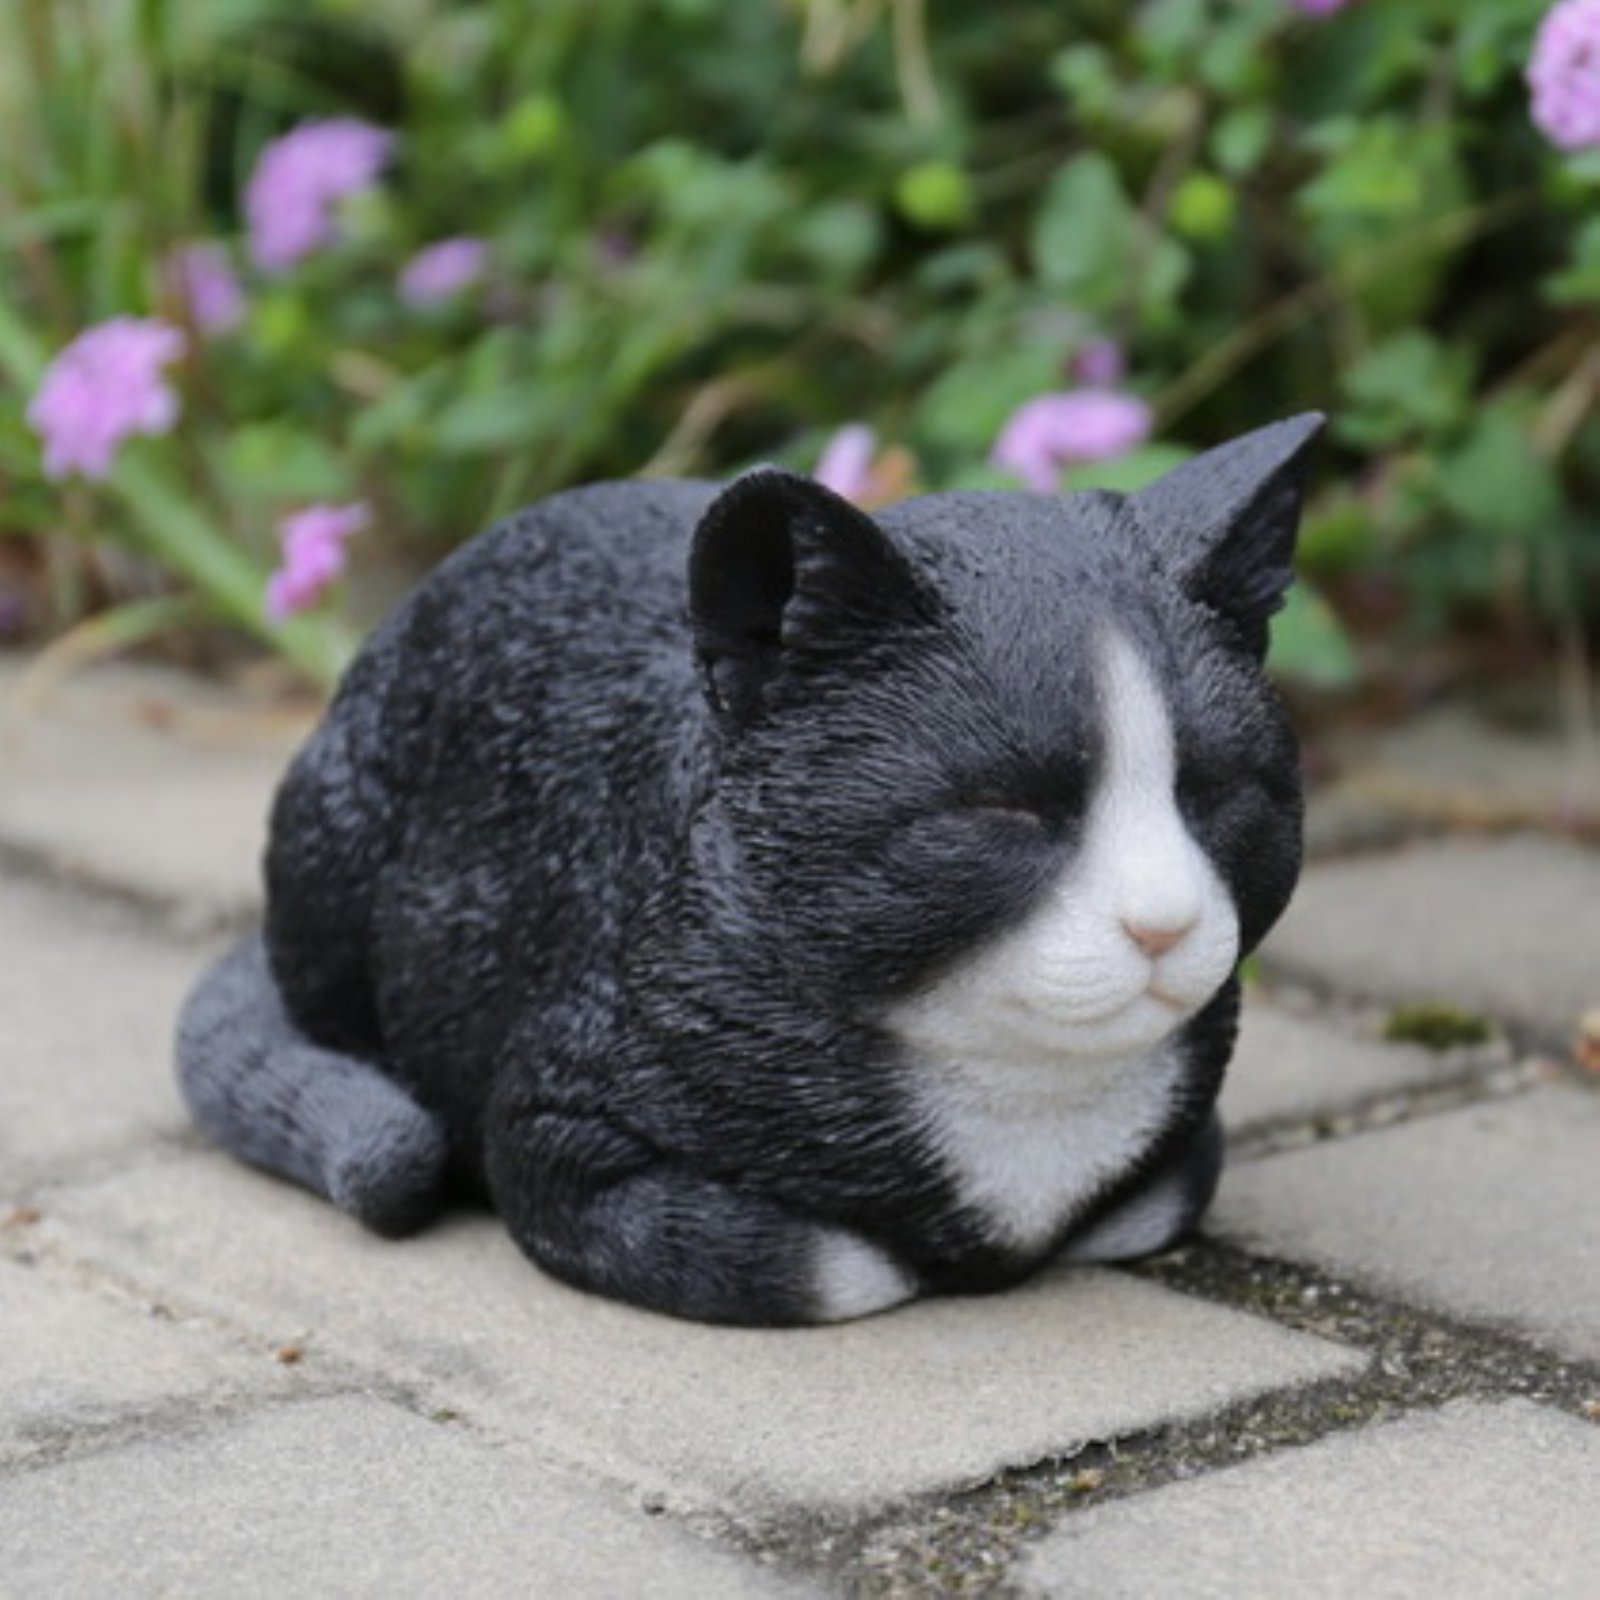 BLACK/WHITE CAT SLEEPING